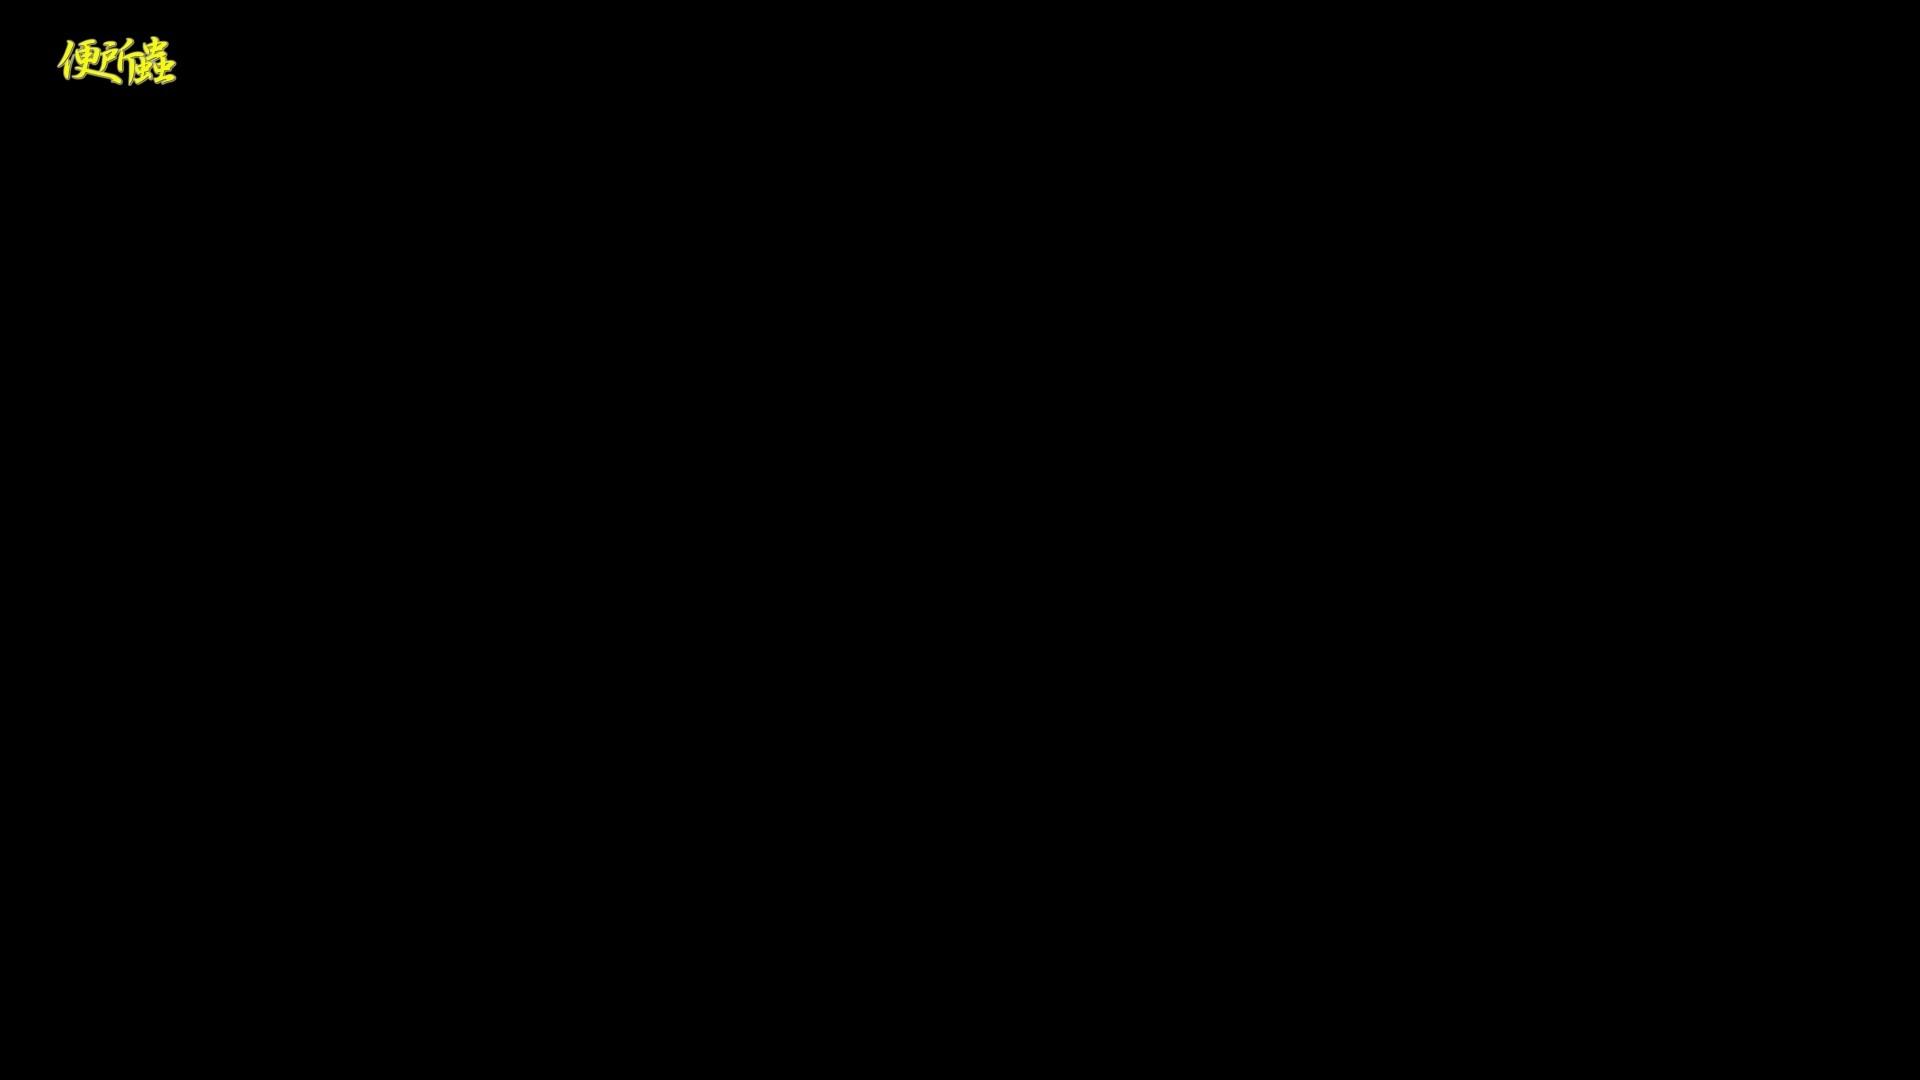 vol.09 便所蟲さんのリターン~寺子屋洗面所盗撮~ 盗撮 | 盛合せ  107画像 91